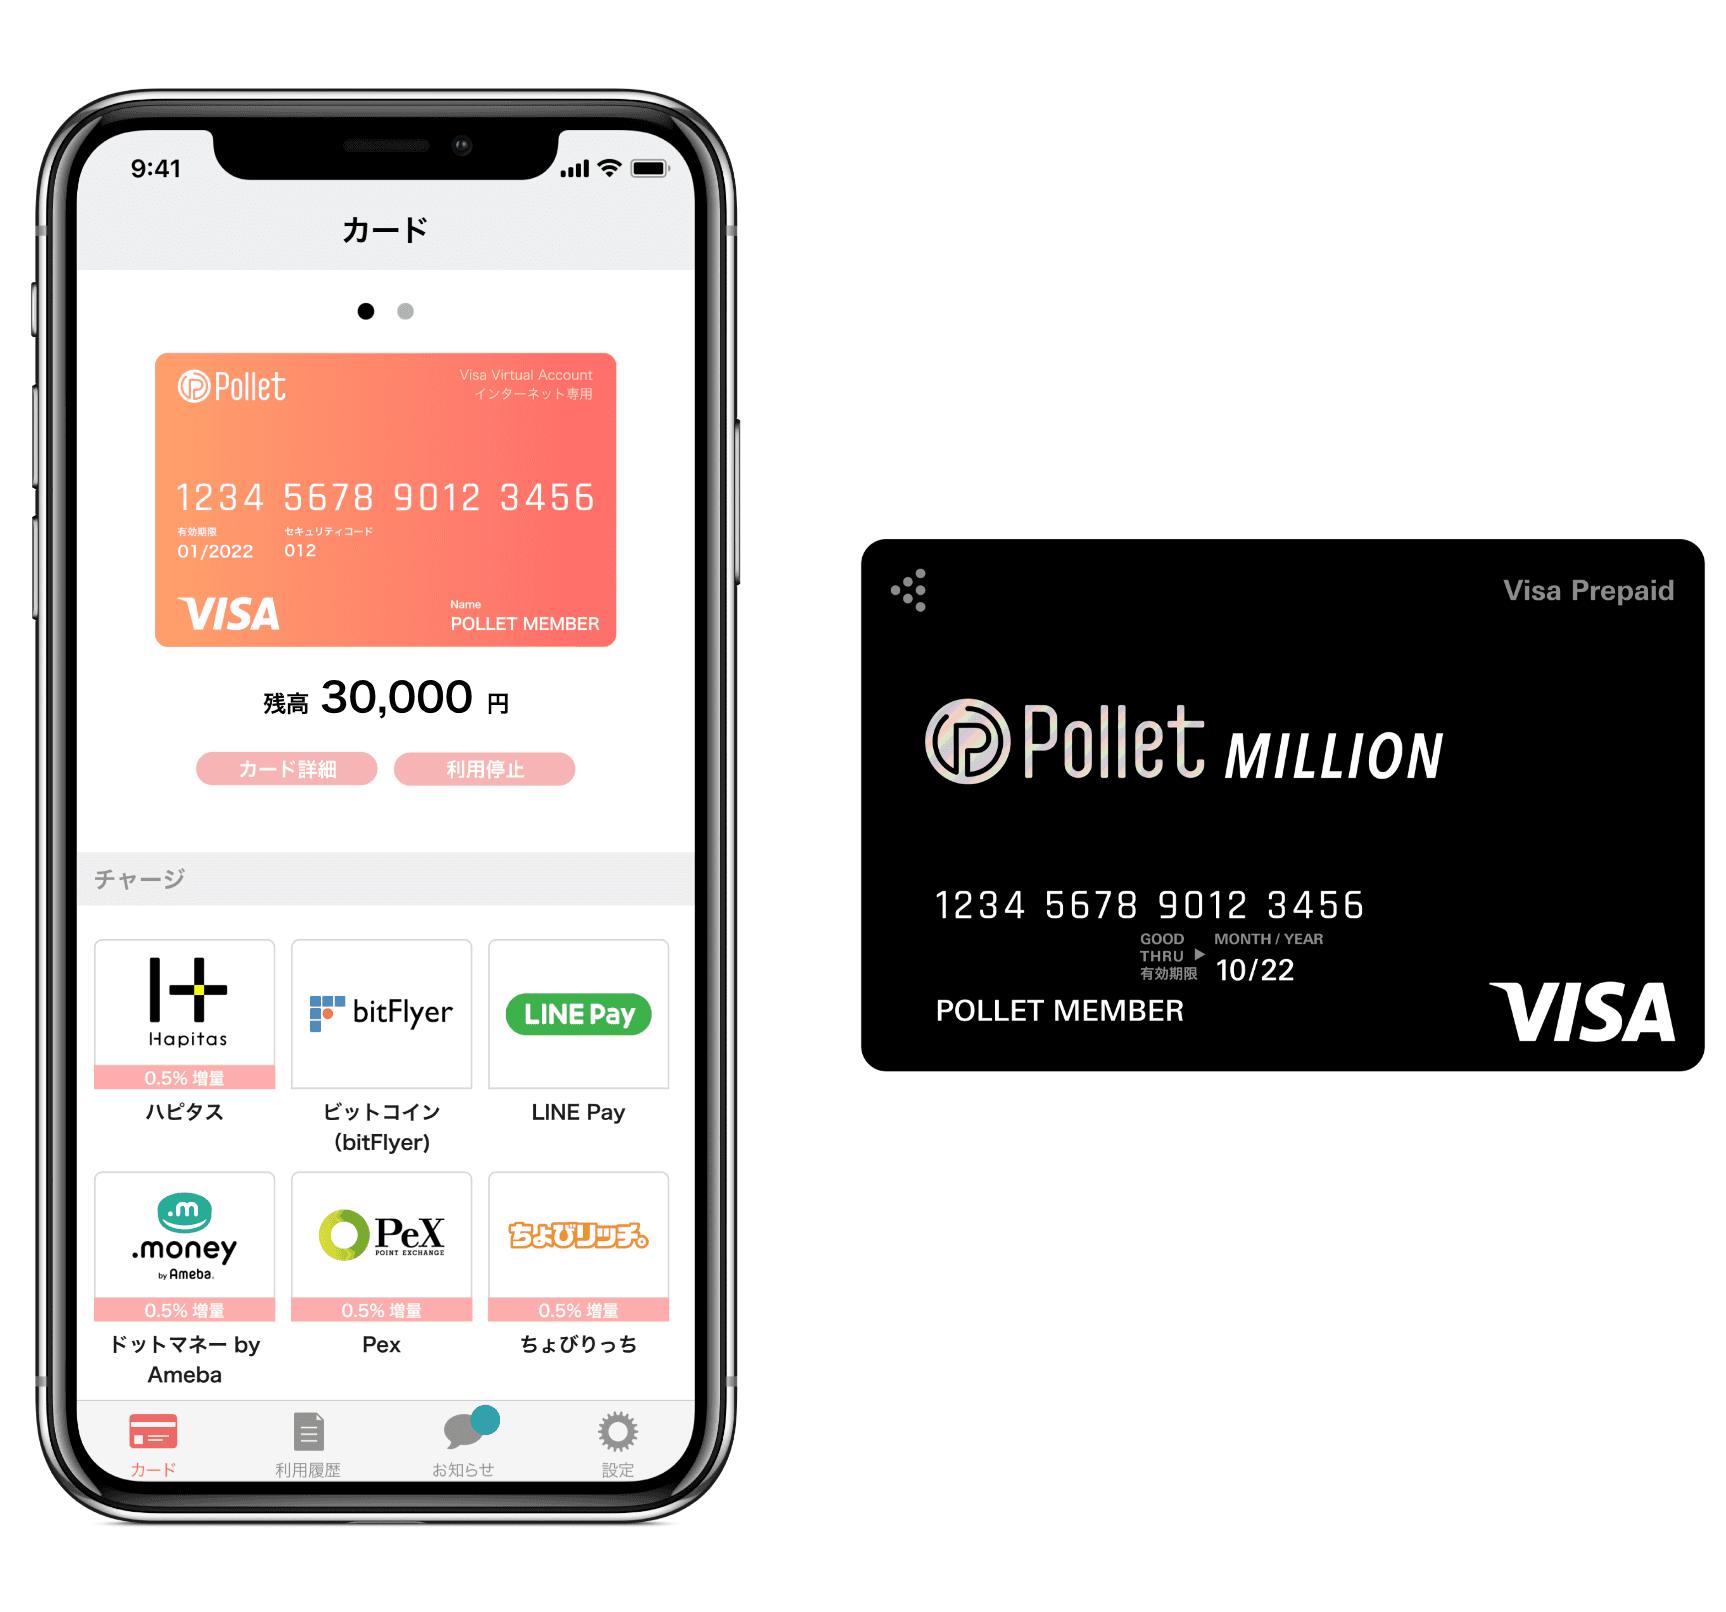 PolletバーチャルカードとPolletMillion